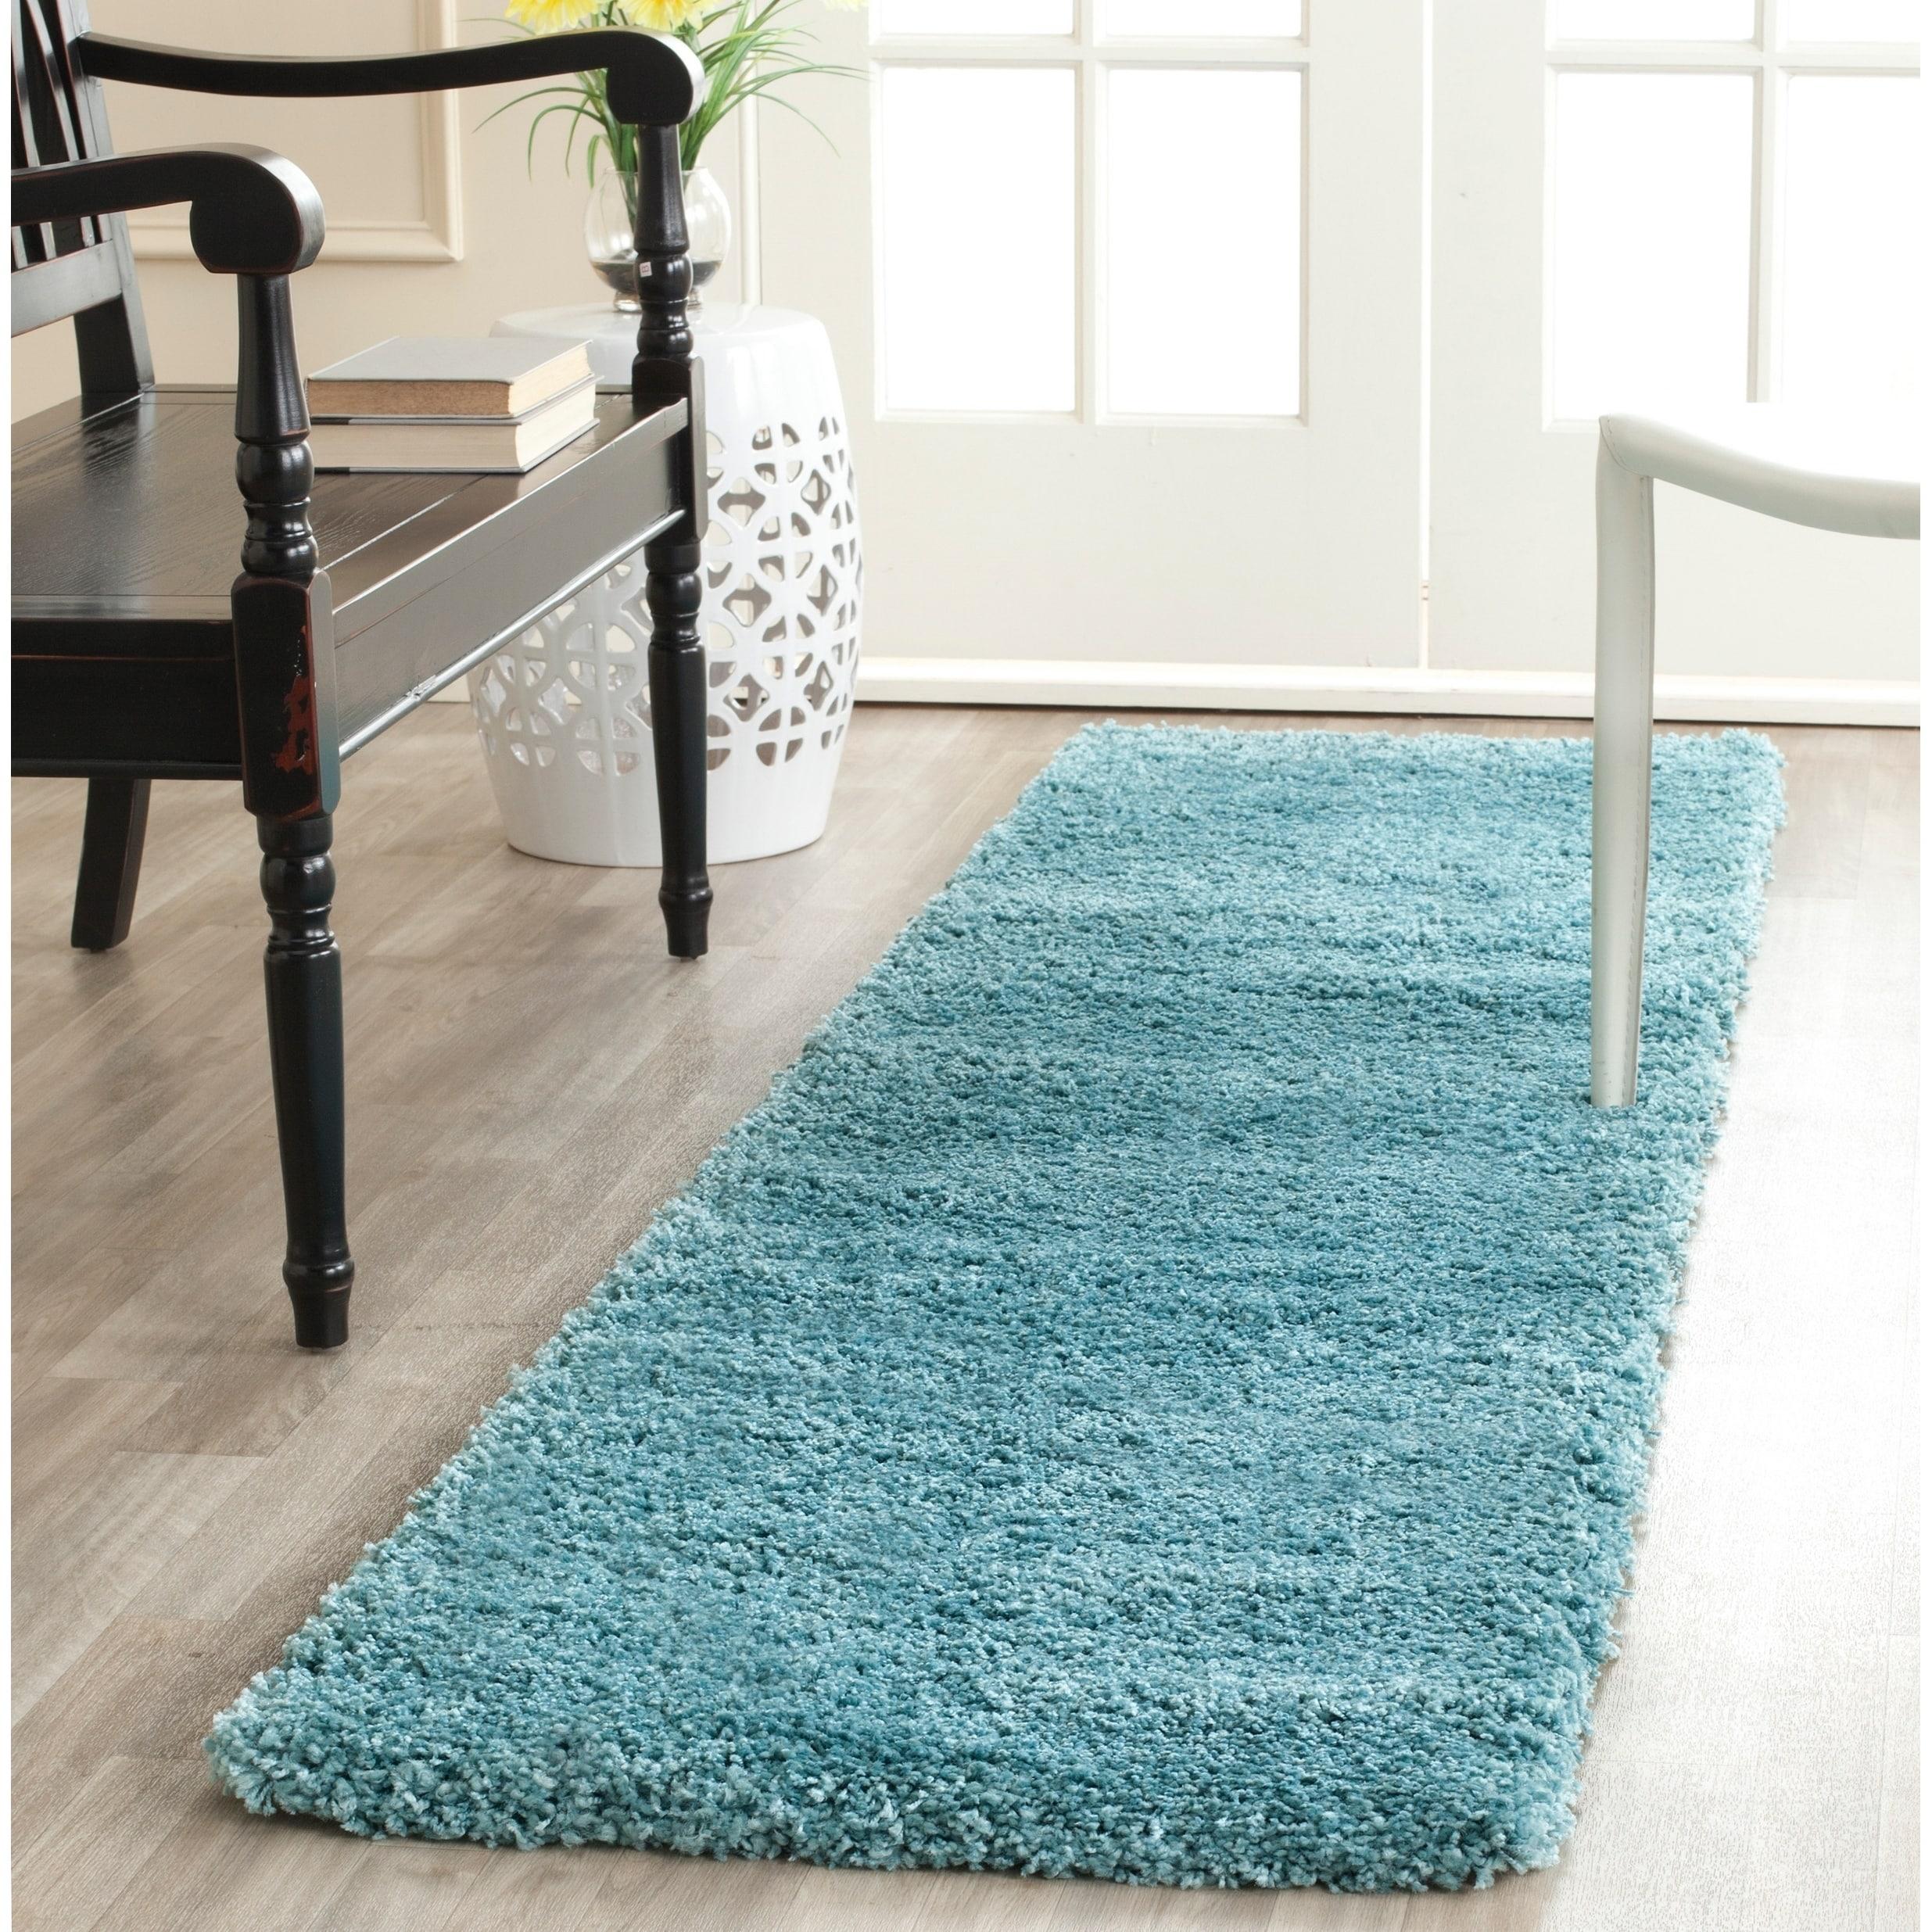 Safavieh Milan Aqua Blue Rug 2 X 8 On Free Shipping Today 8402827